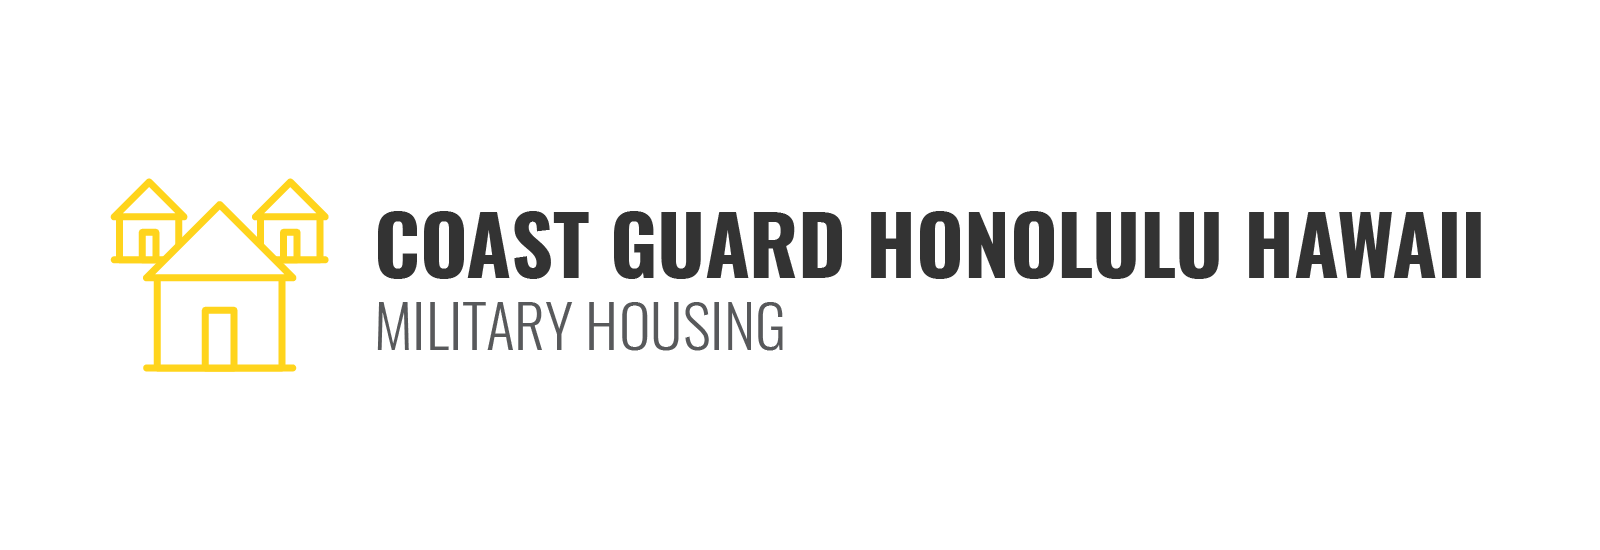 Military Housing for the Coast Guard in Honolulu, Hawaii